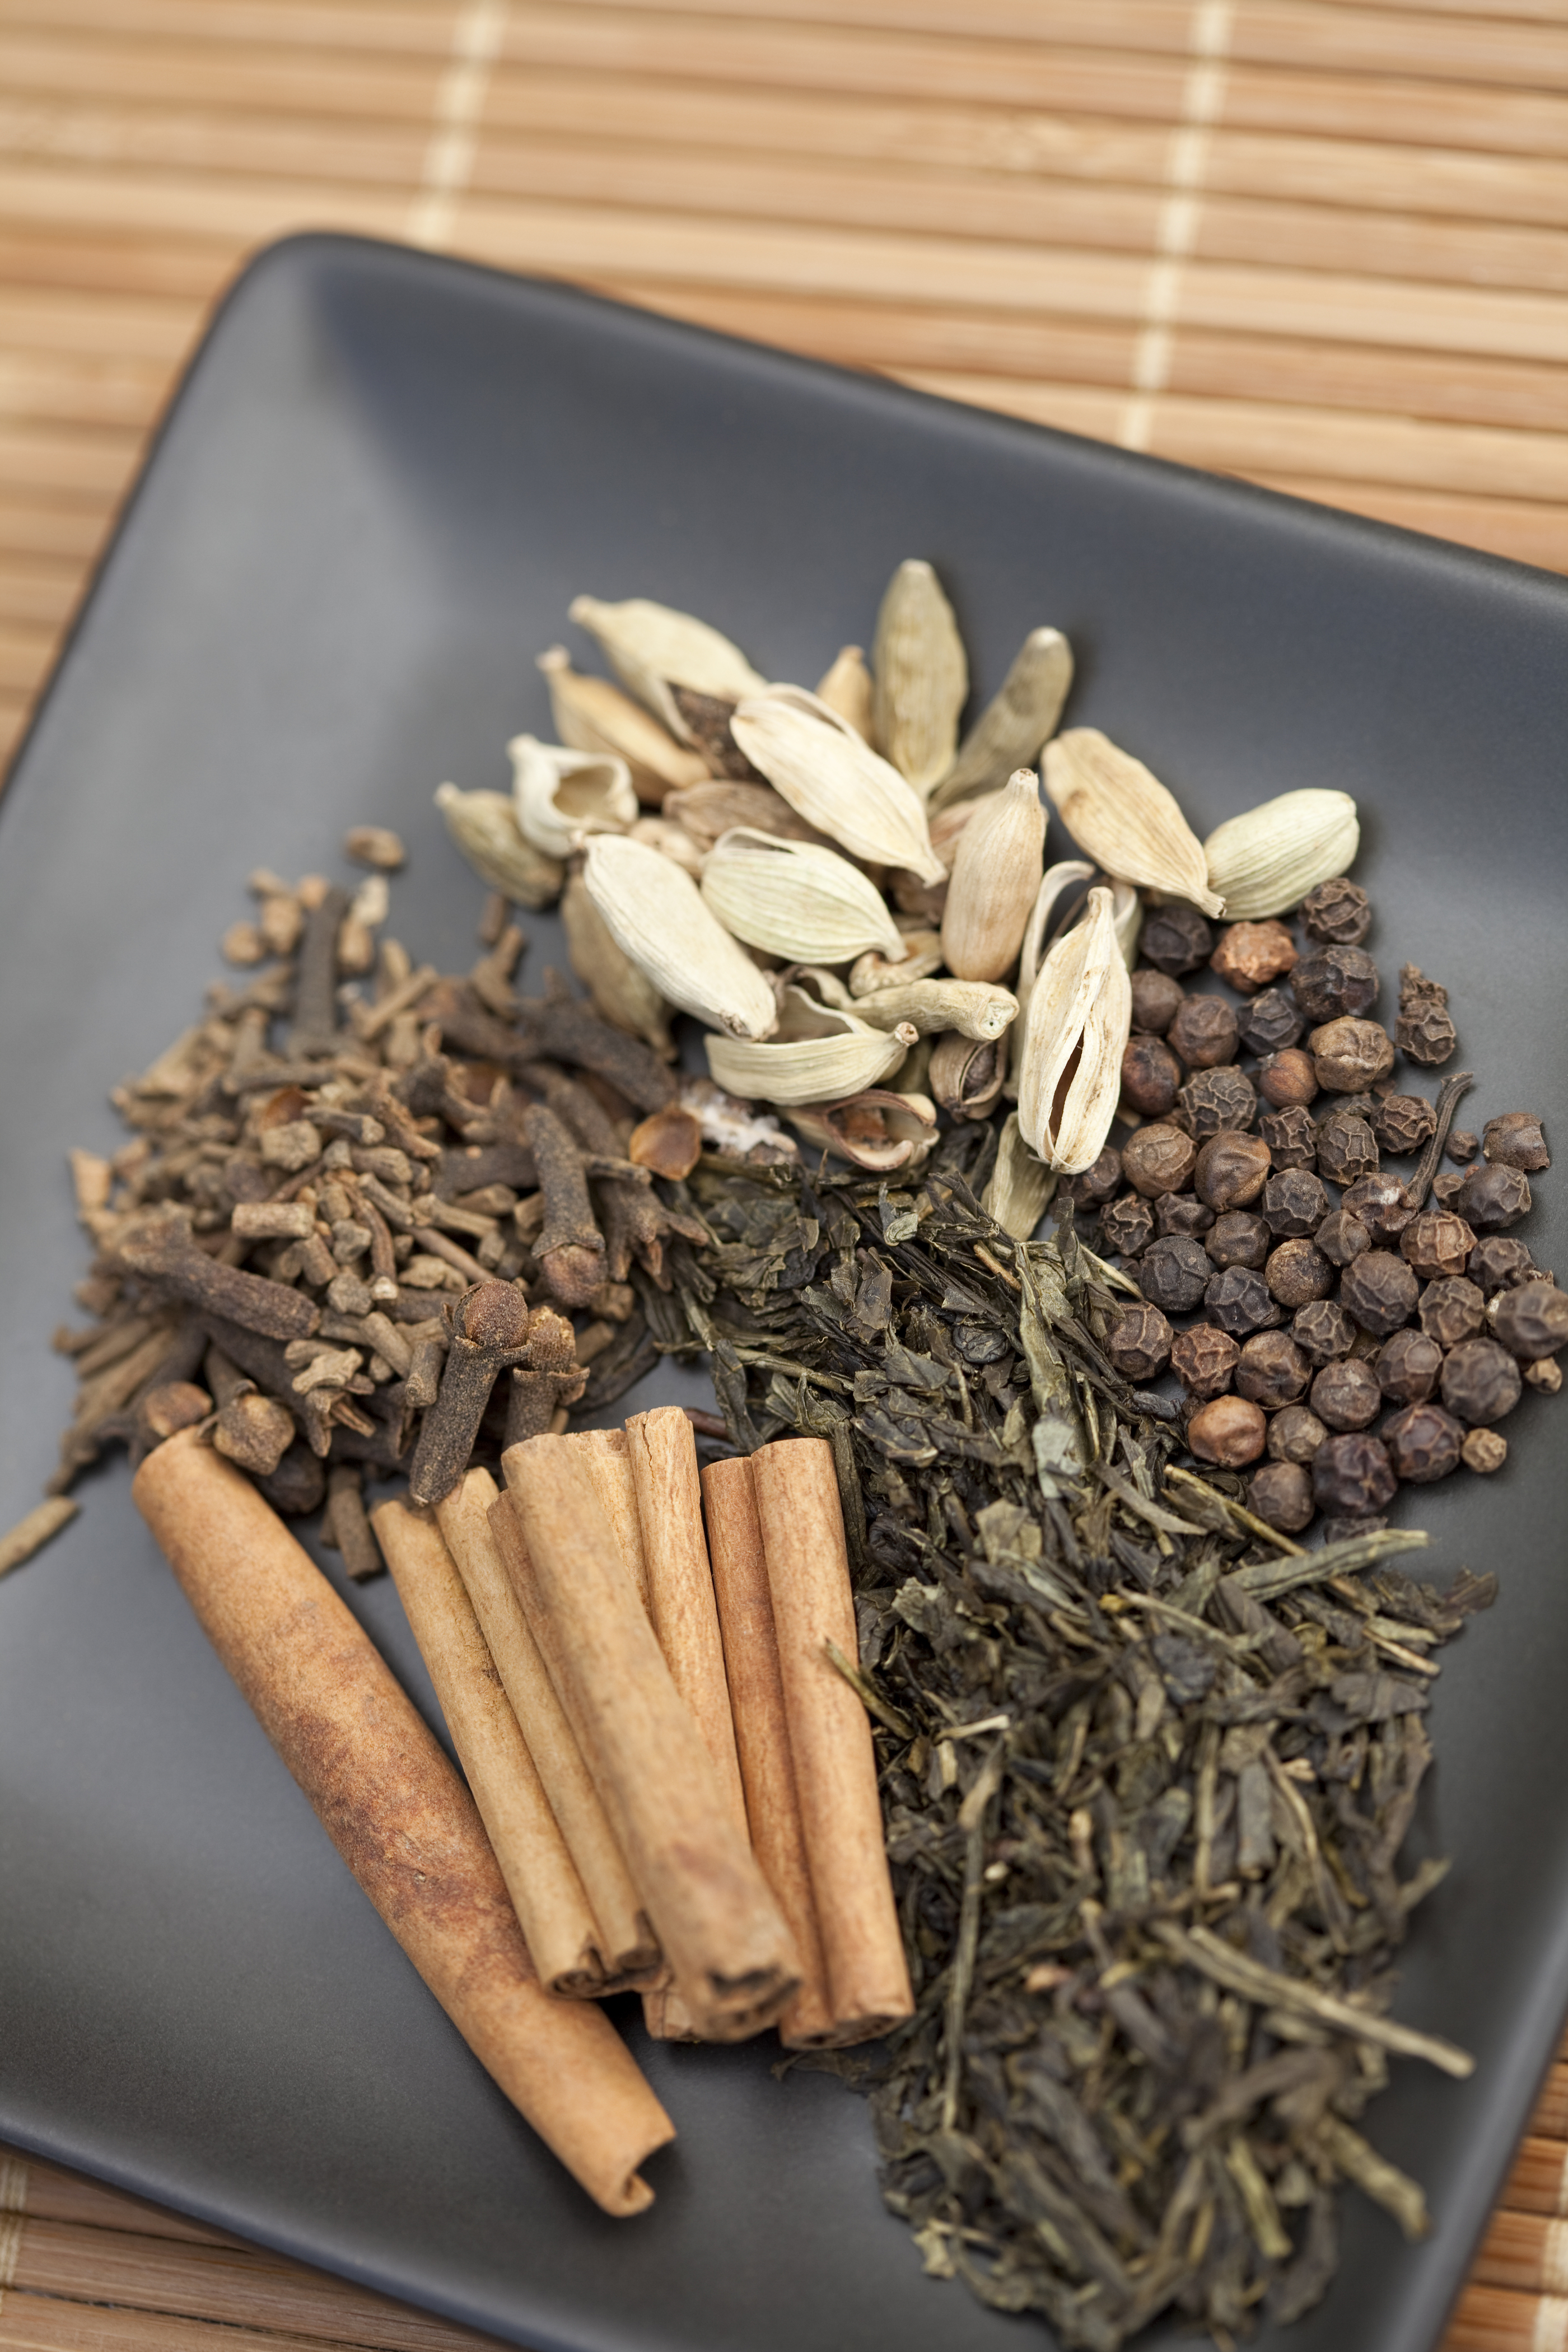 Cardamom, clove, cinnamon, green tea and black pepper